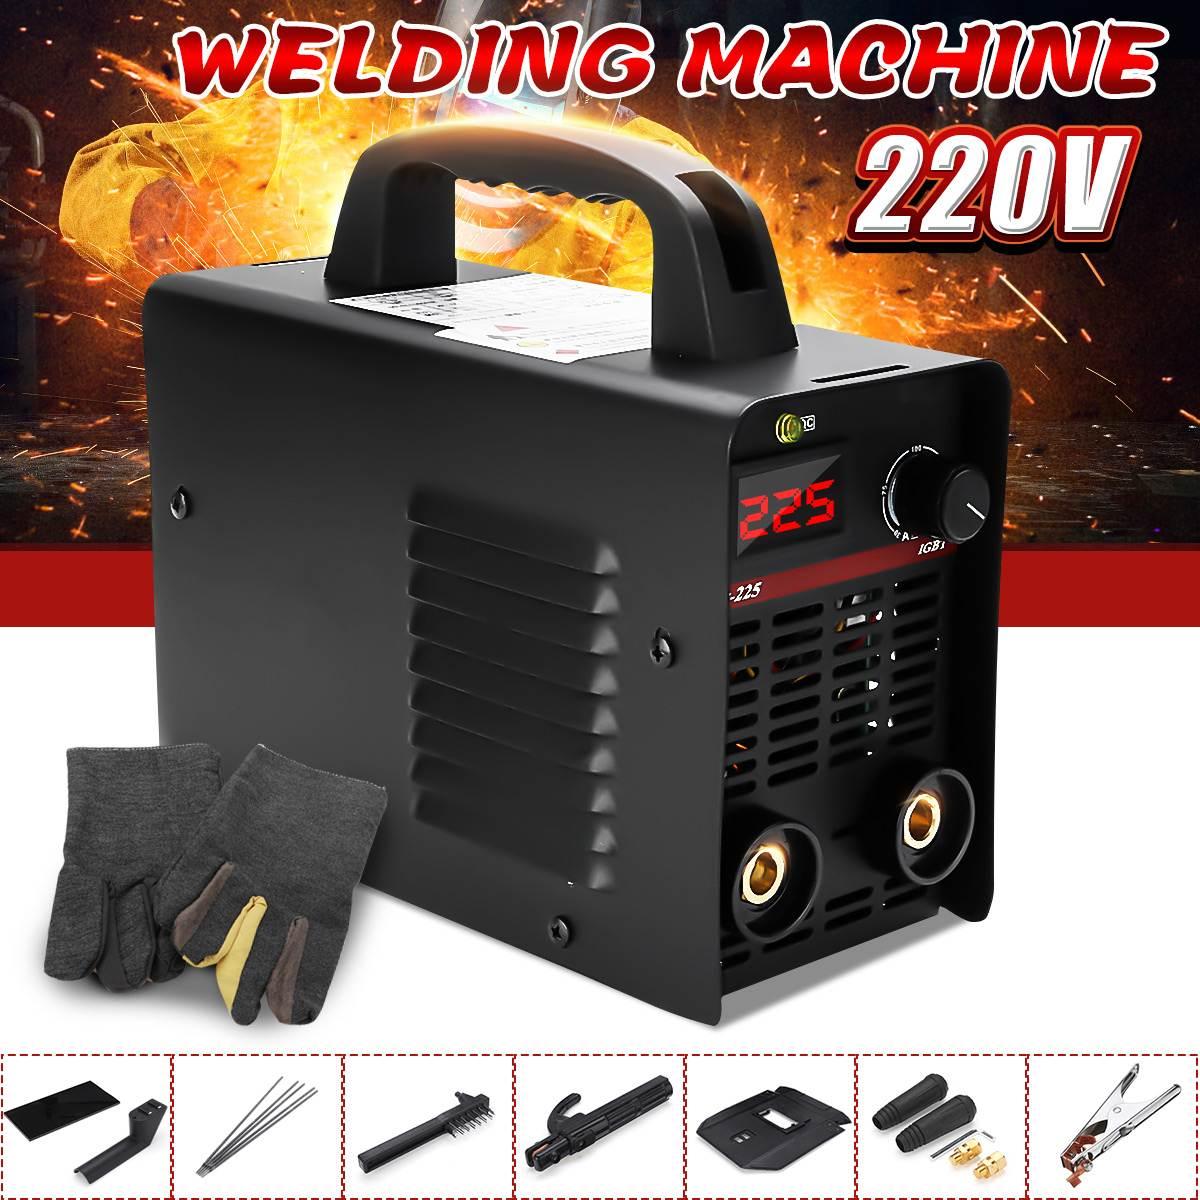 Handheld Inverter Electric Mini ZX7 225 220V 2.5 Metal Stick Welder Machines Electrode Welding Soldering Portable Machine Tools